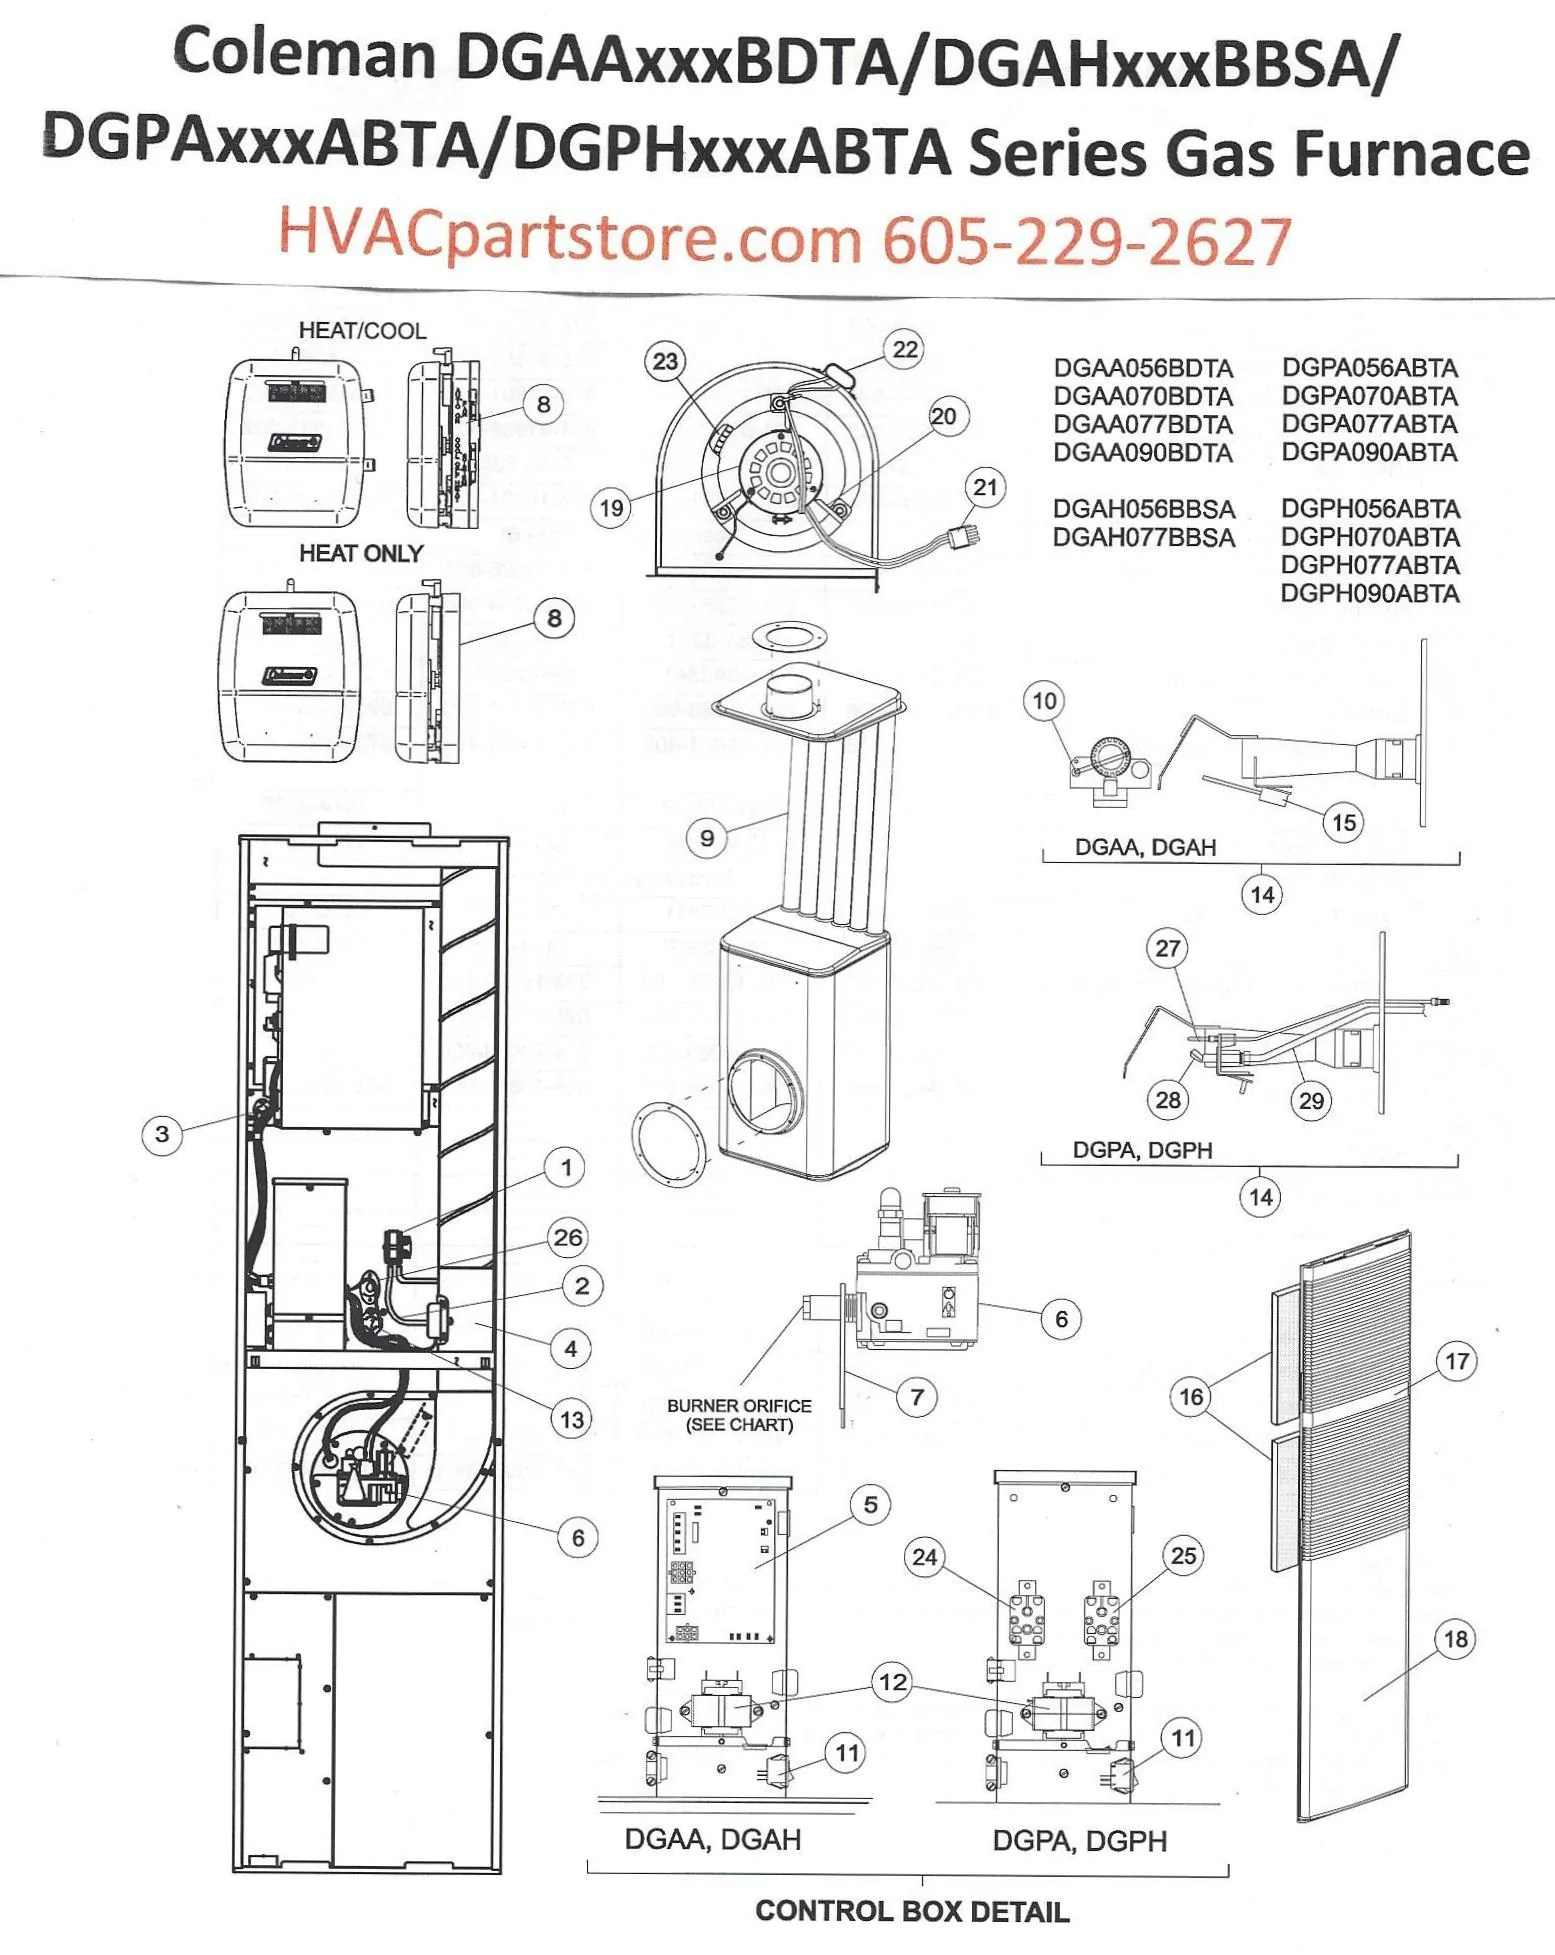 DGAA070BDTA Coleman Gas Furnace Parts  HVACpartstore